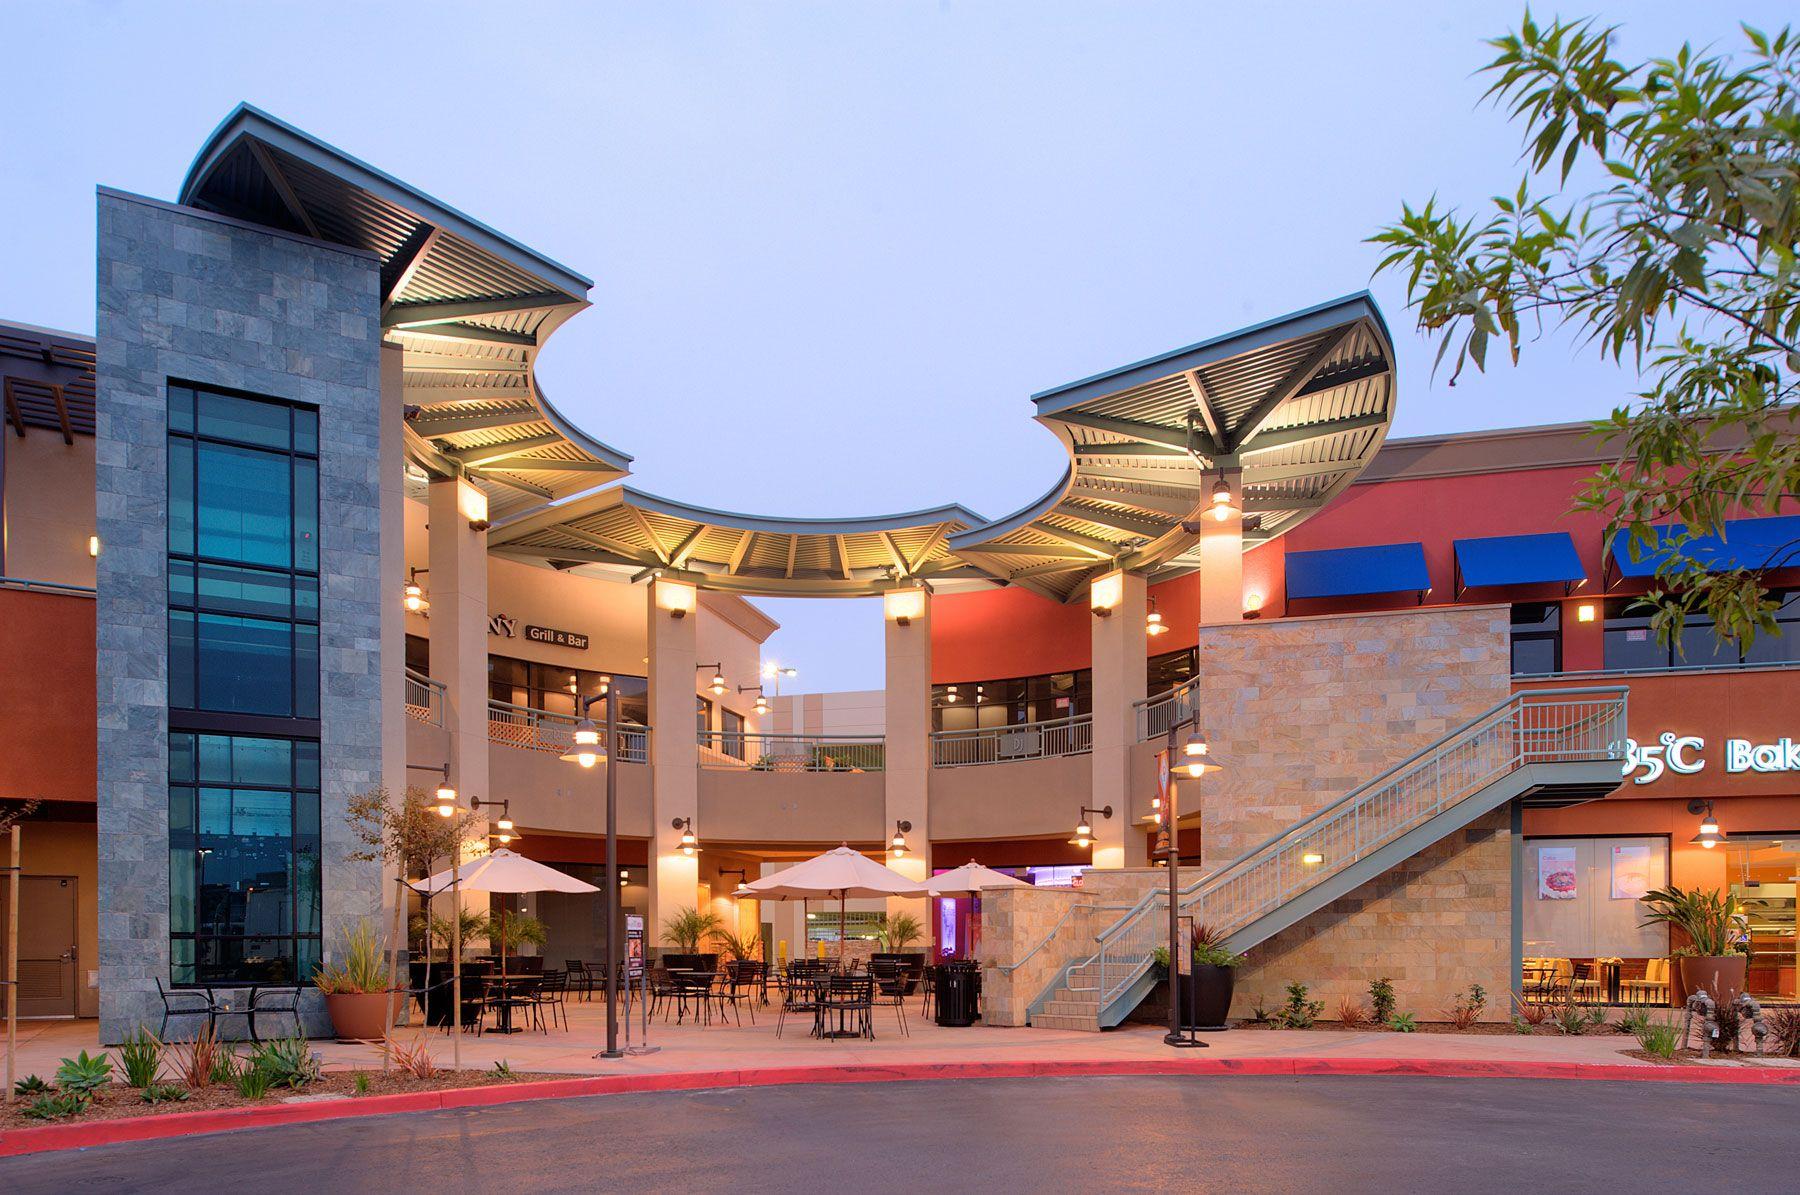 Diamond Jamboree Is A Vibrant Bustling Retail Center Conveniently